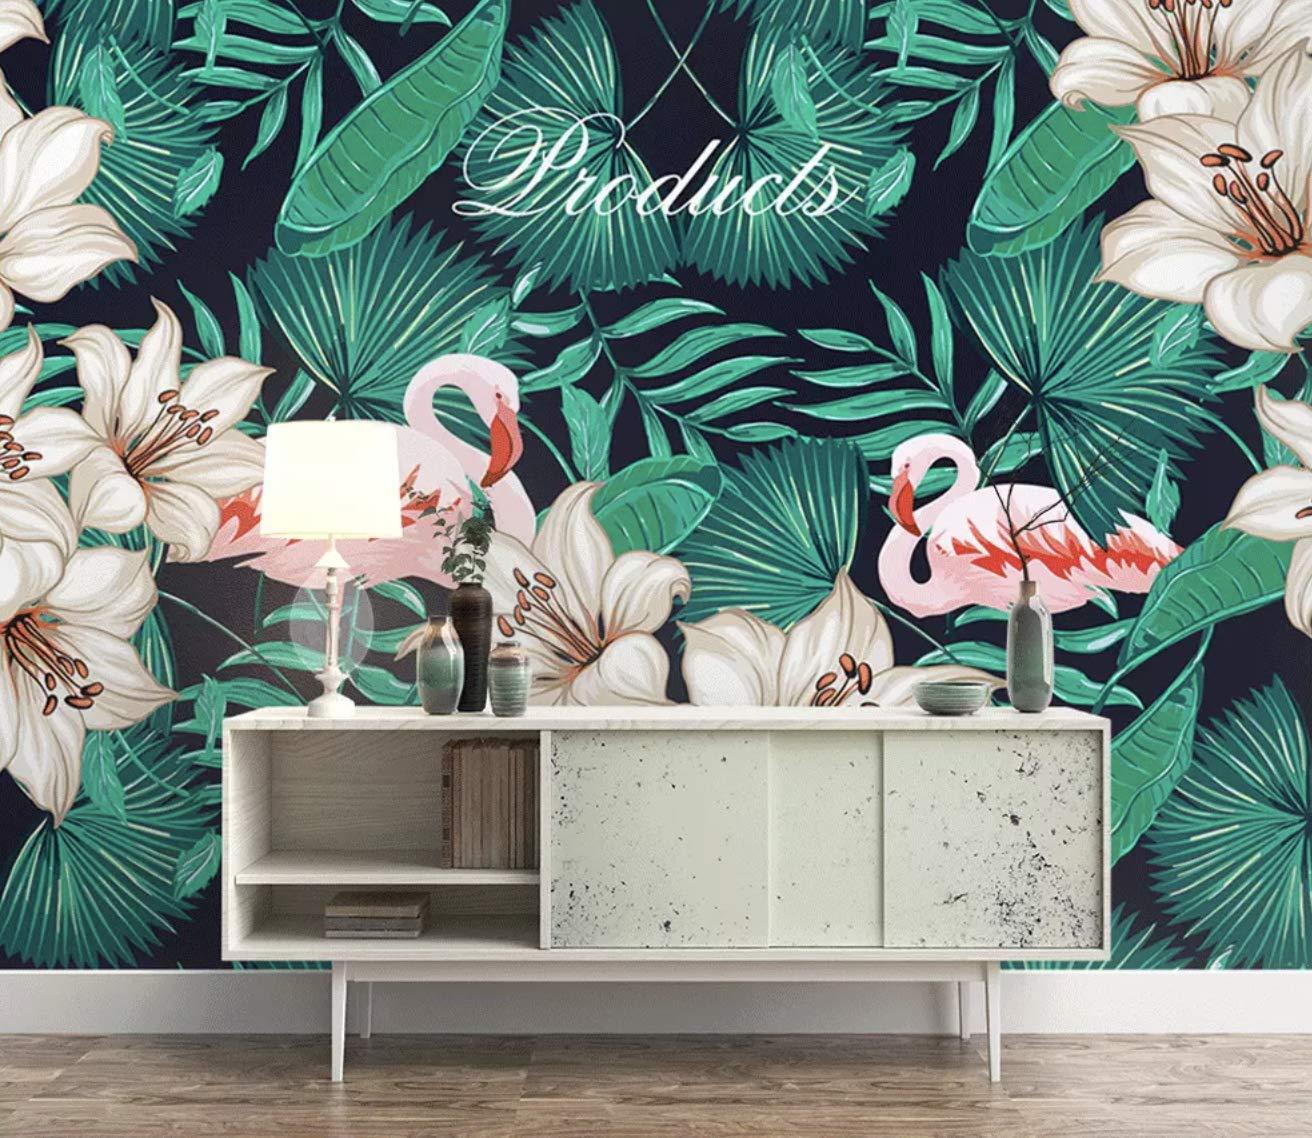 Free Download Amazoncom Murwall Flamingo Wallpaper Leaf Wall Mural